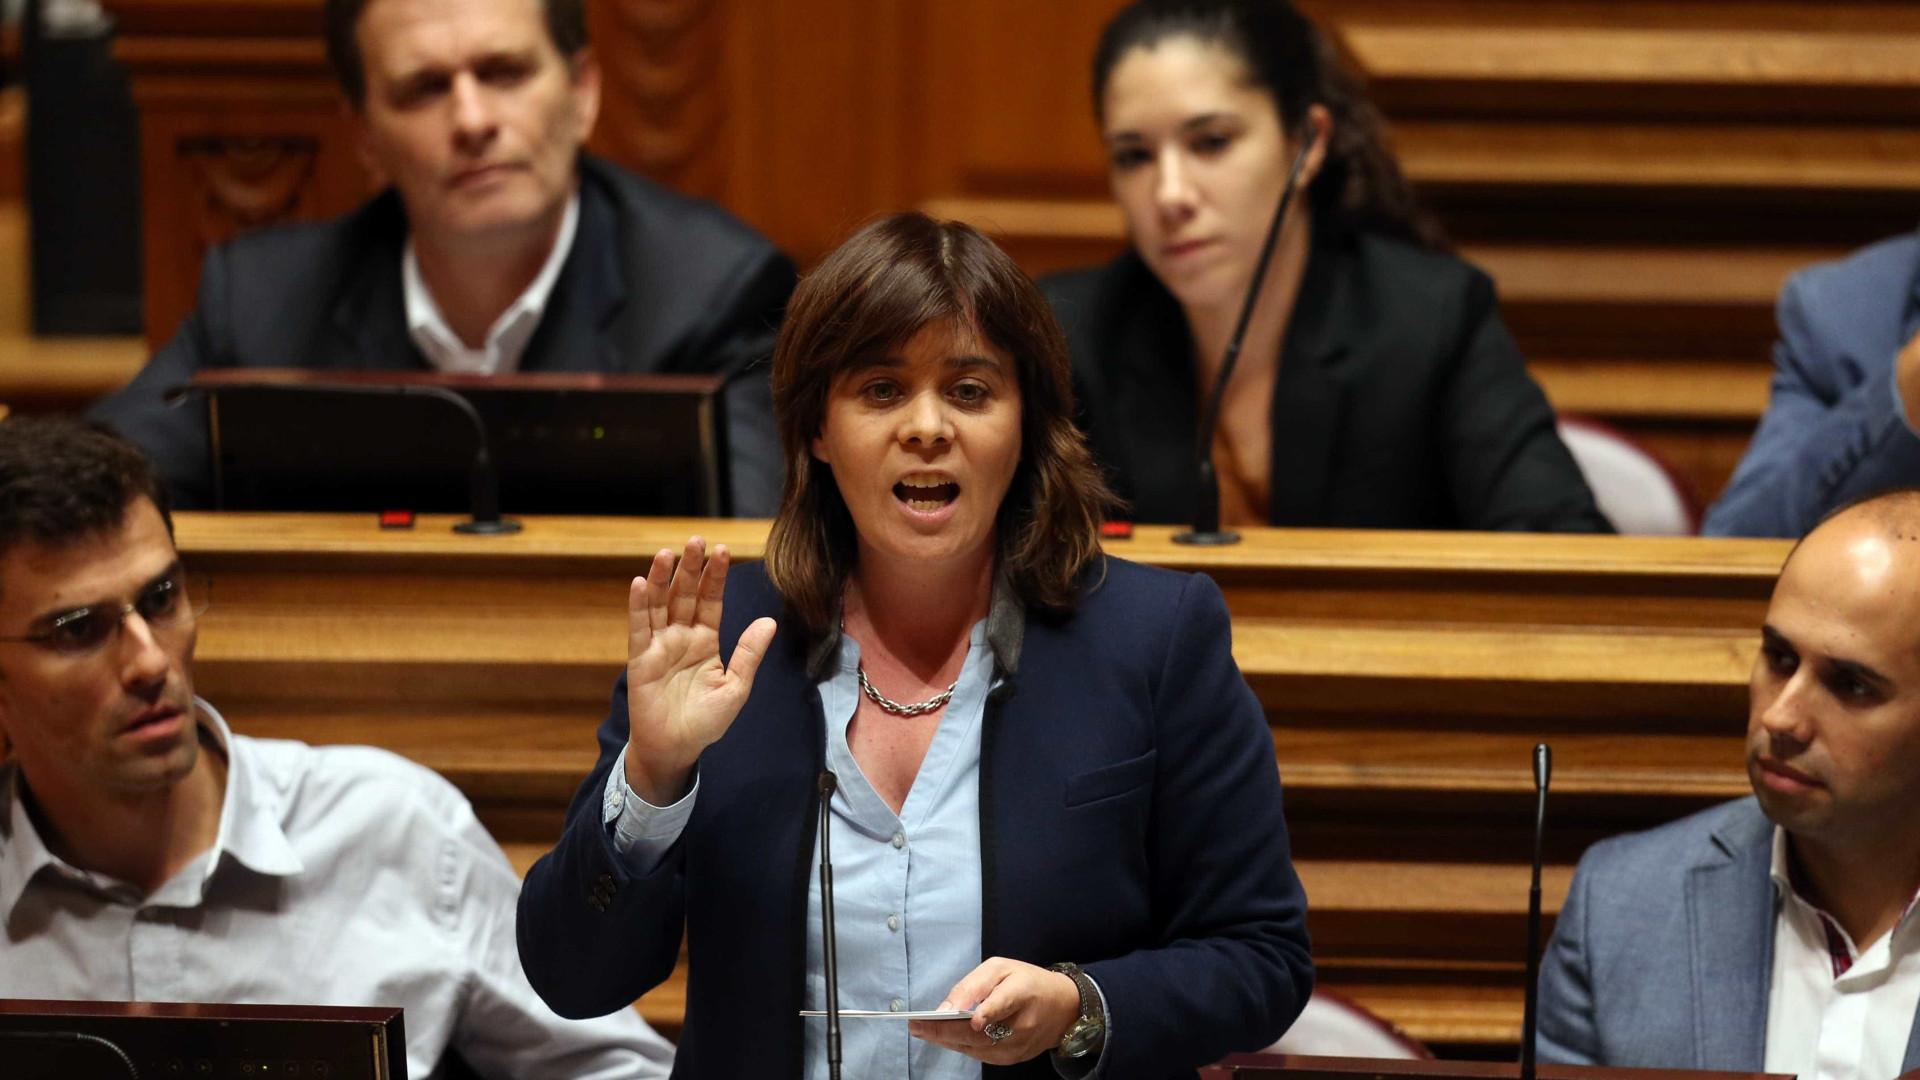 Catarina Martins contraria António Costa: era possível